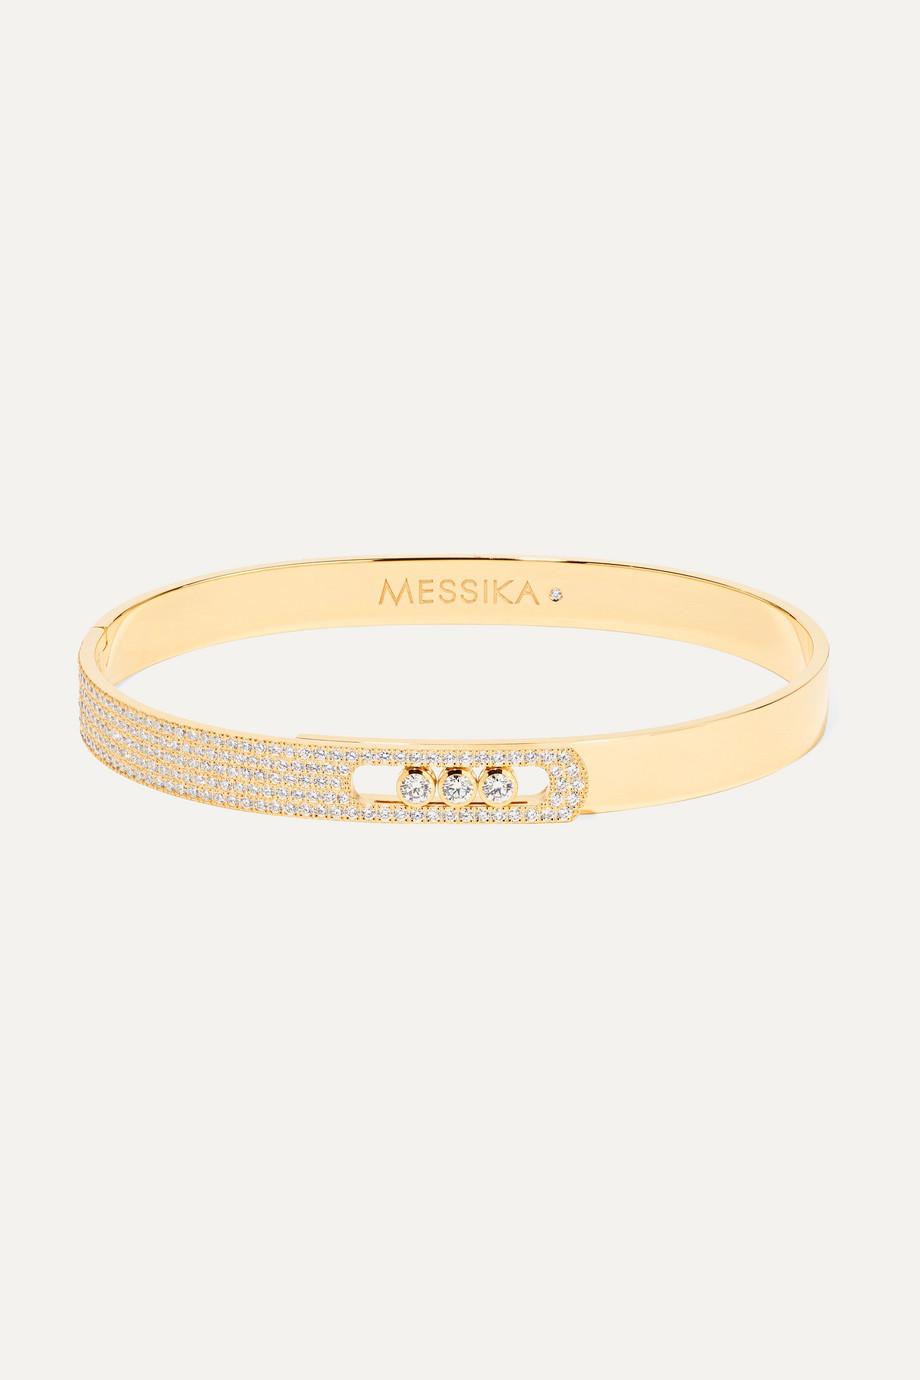 Messika Move Noa Armreif aus 18 Karat Gold mit Diamanten